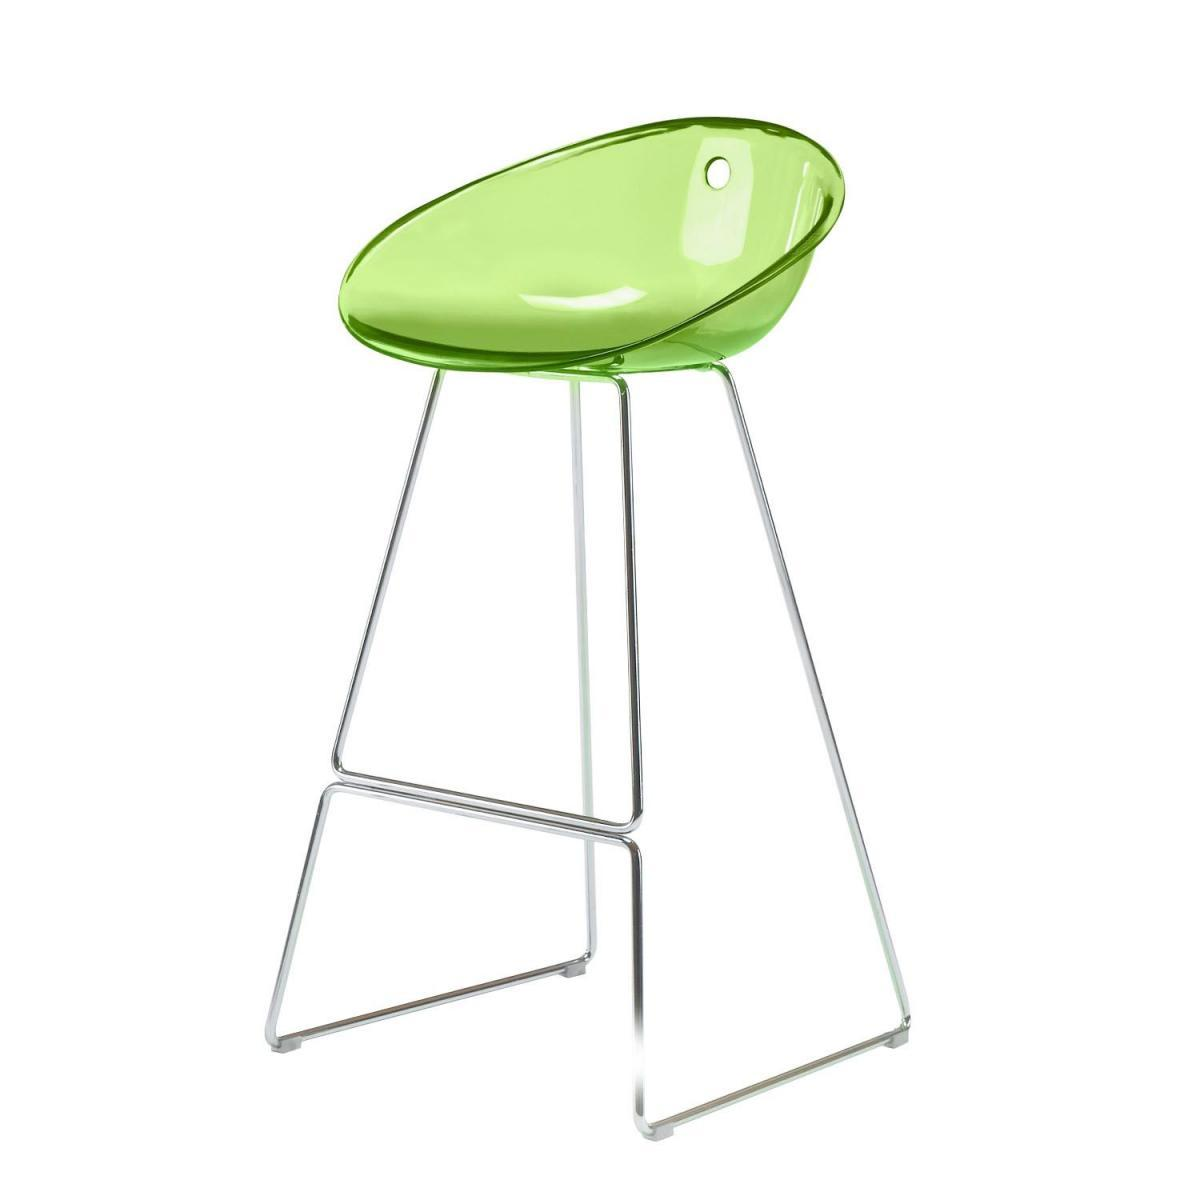 Полубарный прозрачный стул Gliss